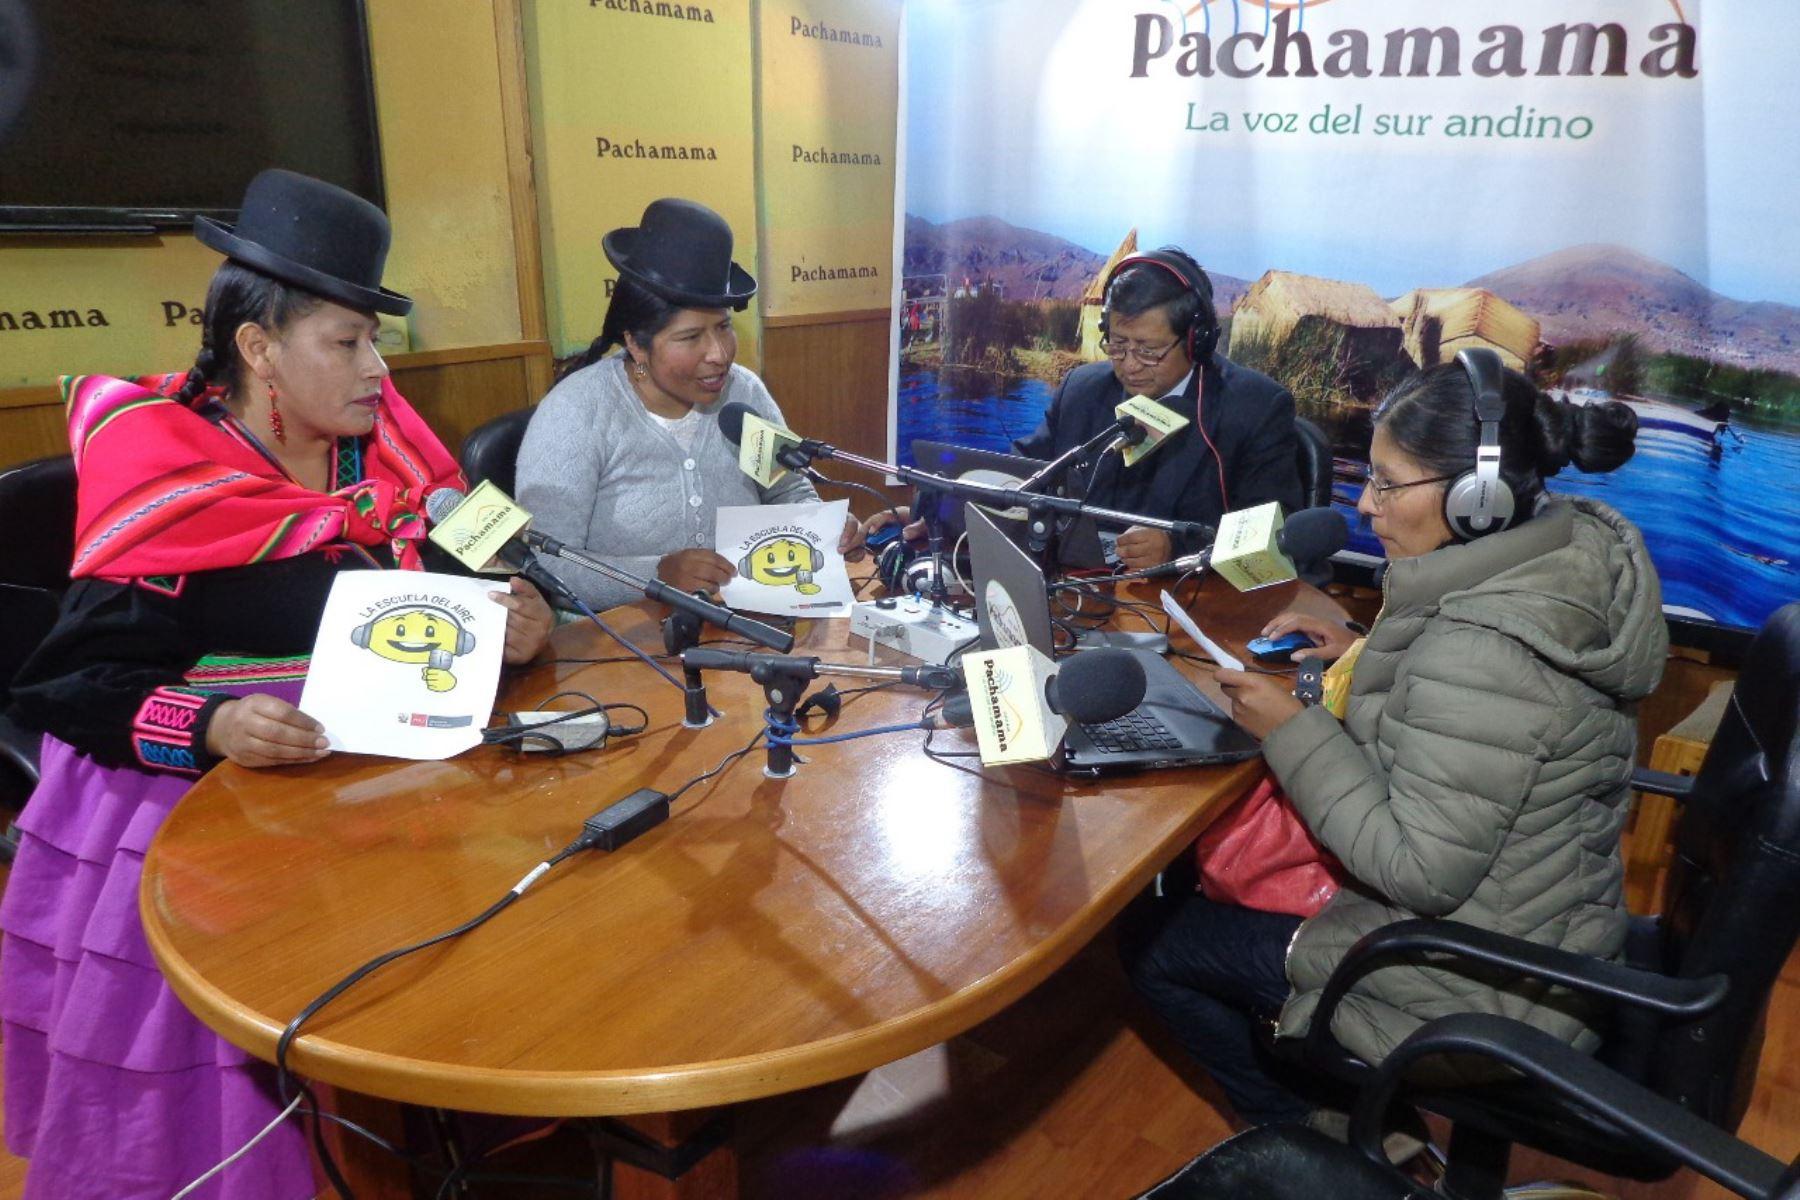 Ministerio de Educación inicia emisión de programa educativo radial en lenguas originarias. ANDINA/Difusión